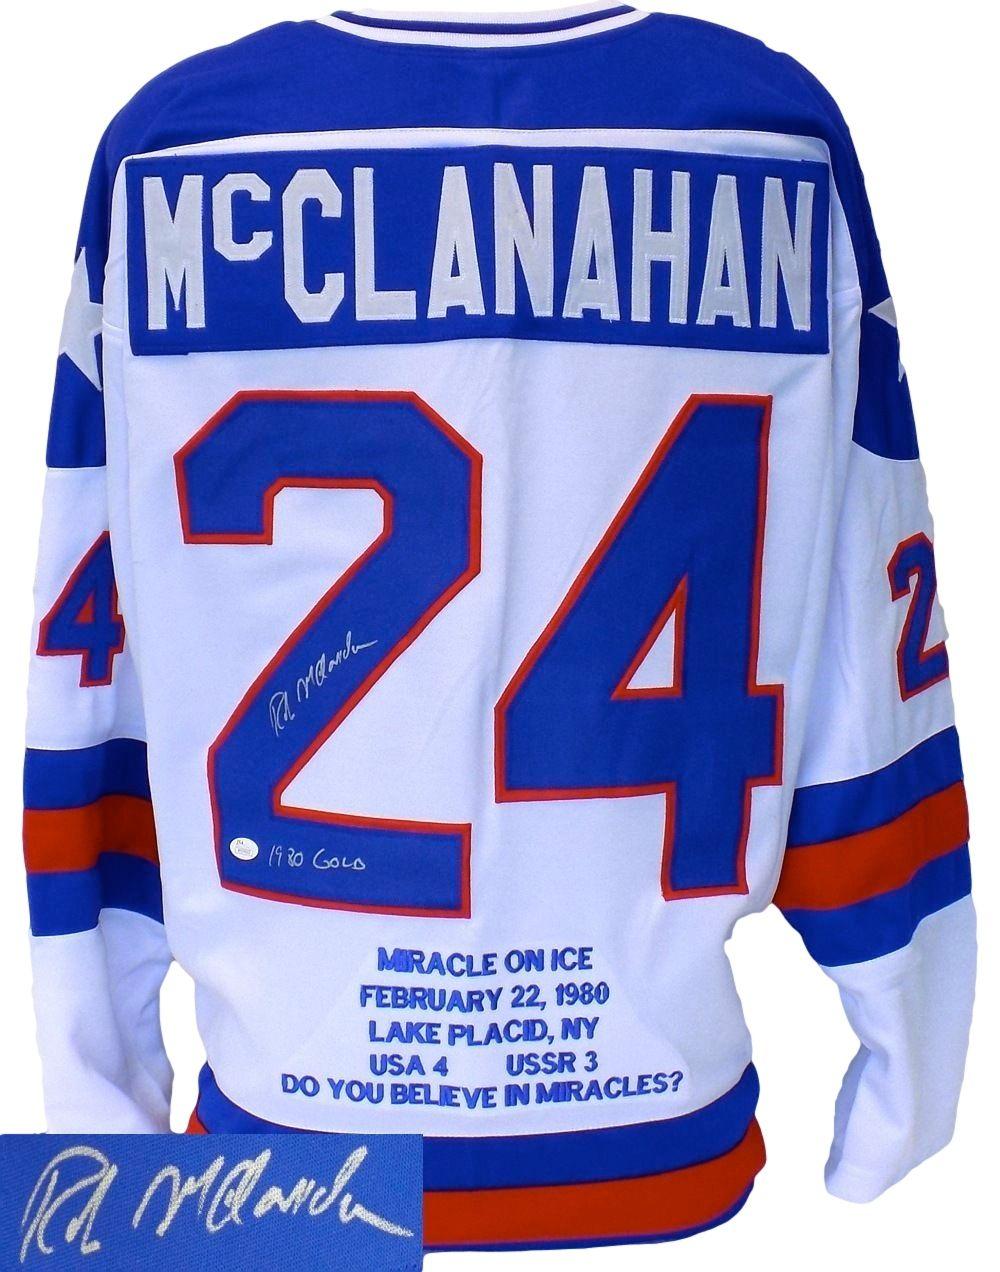 Rob Mcclanahan Signed Miracle On Ice Stat Hockey Jersey 1980 Gold Insc Jsa Sports Integrity Hockey Jersey Jersey Olympic Hockey